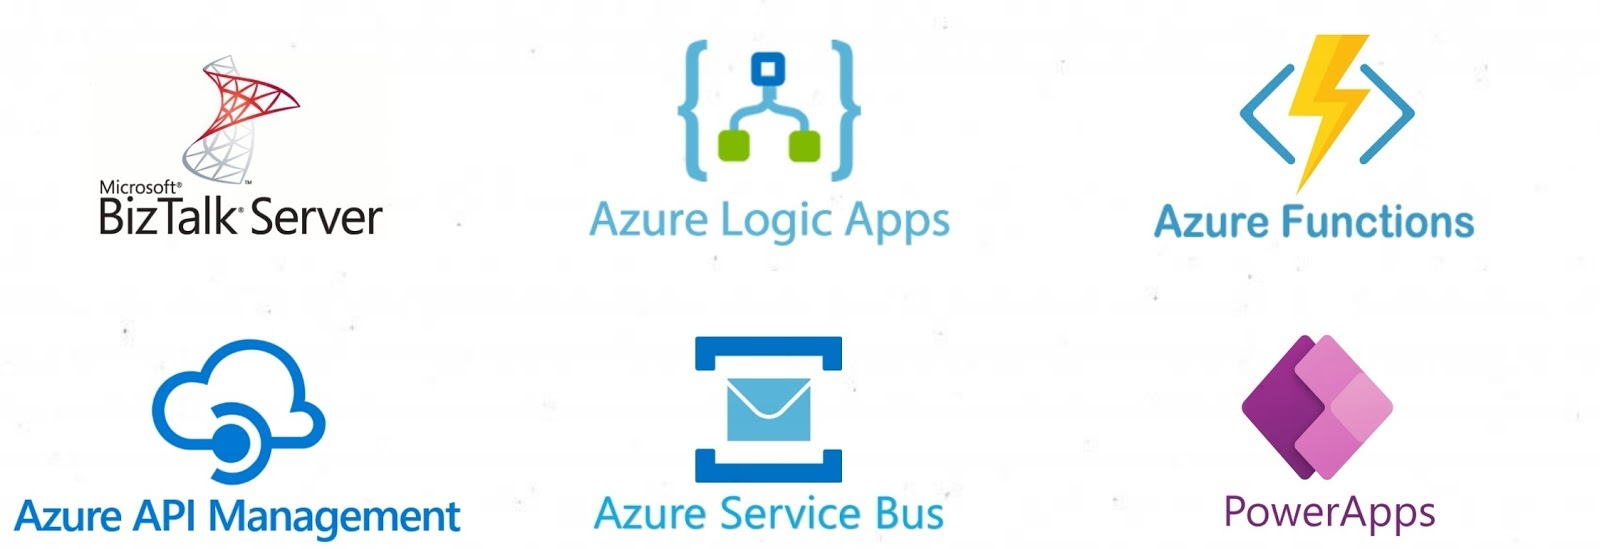 May 17, 2021 Weekly Update on Microsoft Integration Platform & Azure iPaaS